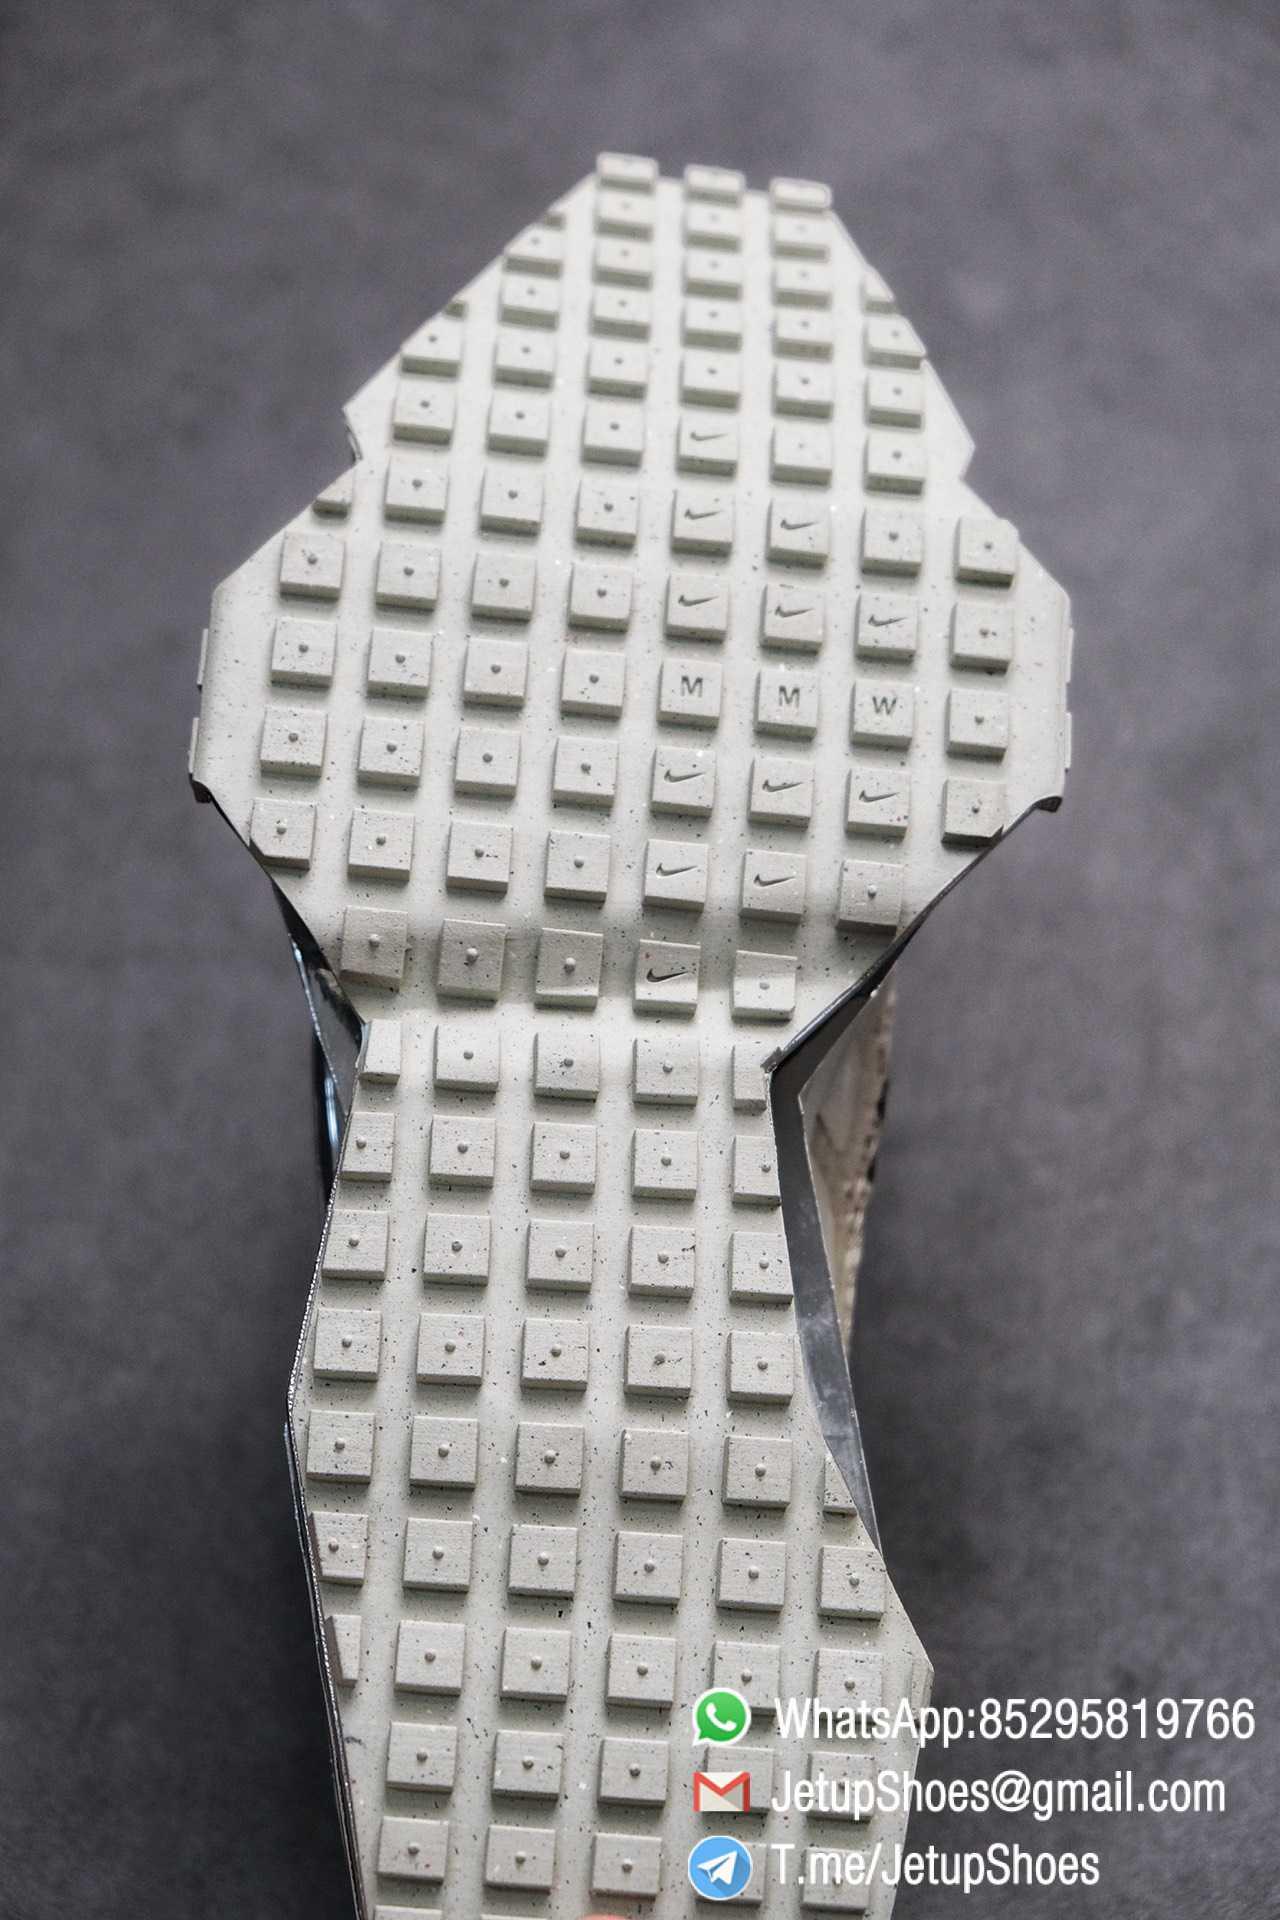 Best Replica Sneakers Matthew M Williams x Nike Zoom 004 Stone CU0676 200 Top Sneakers 012